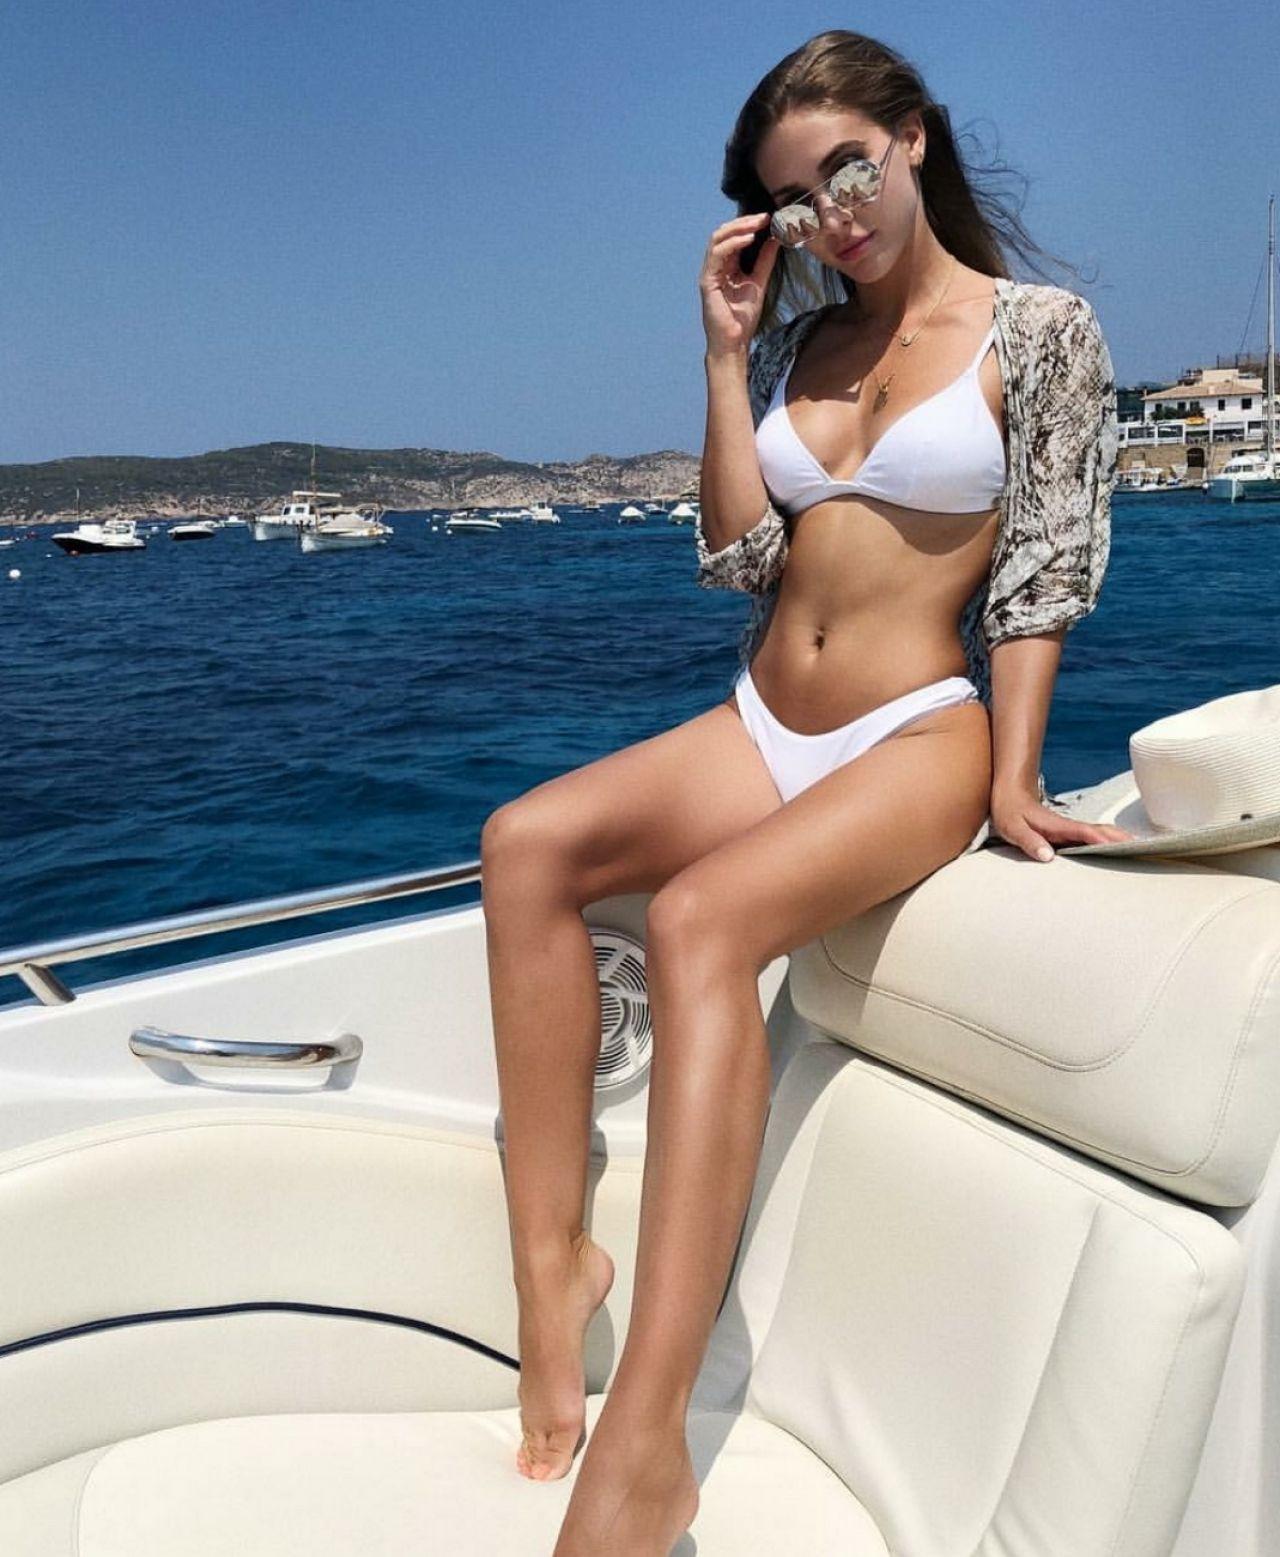 Brömmel bikini ann-kathrin Ann Kathrin